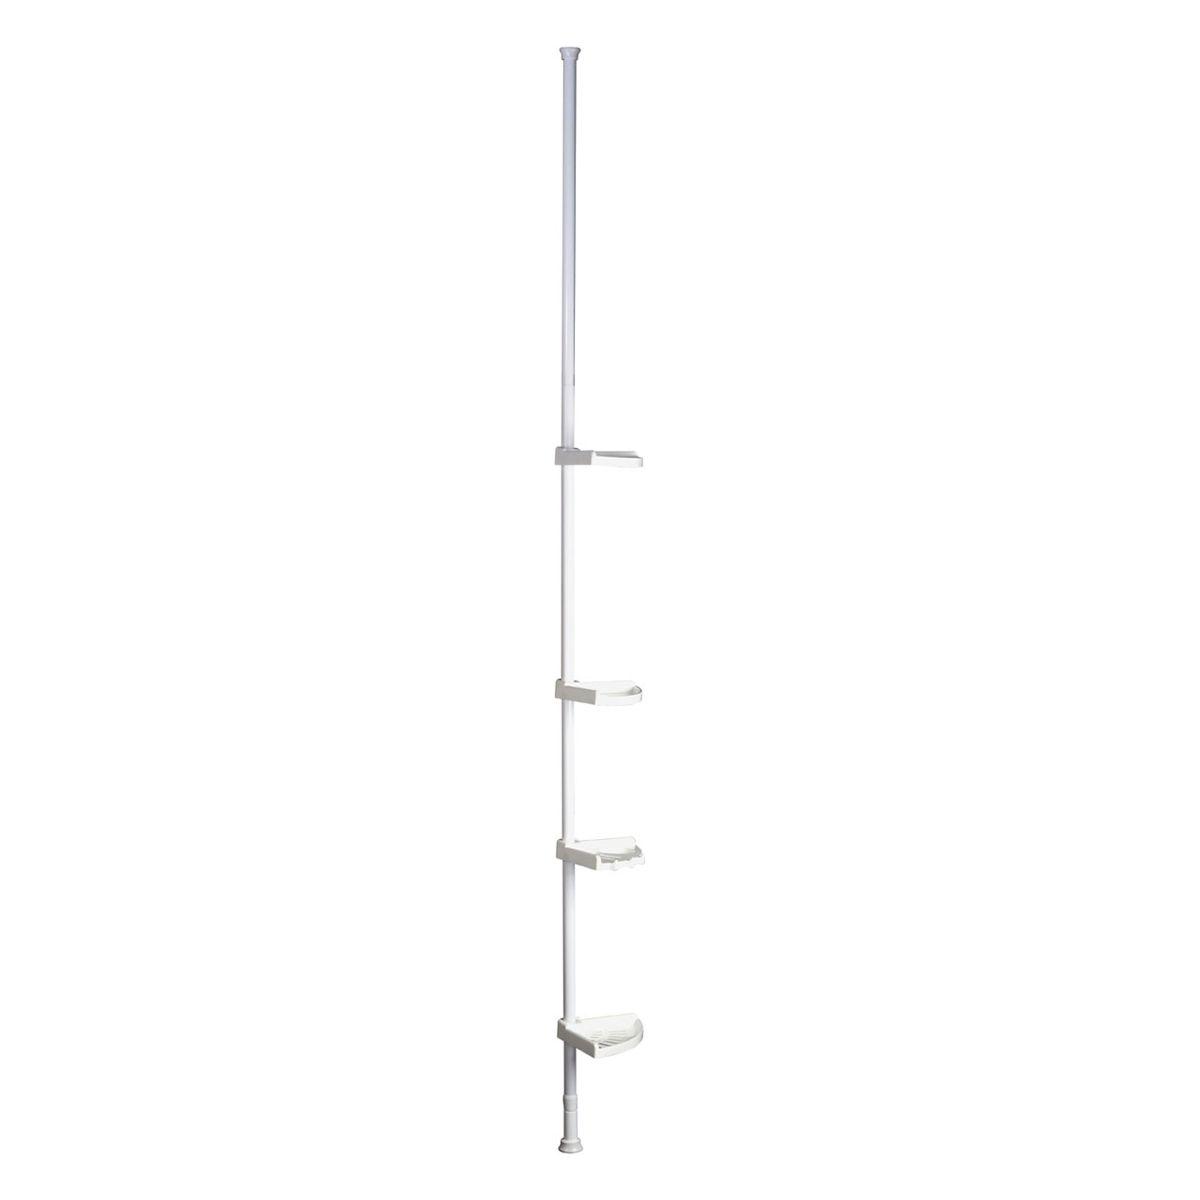 Premier Housewares 4 Tier Telescopic Corner Shelf Unit